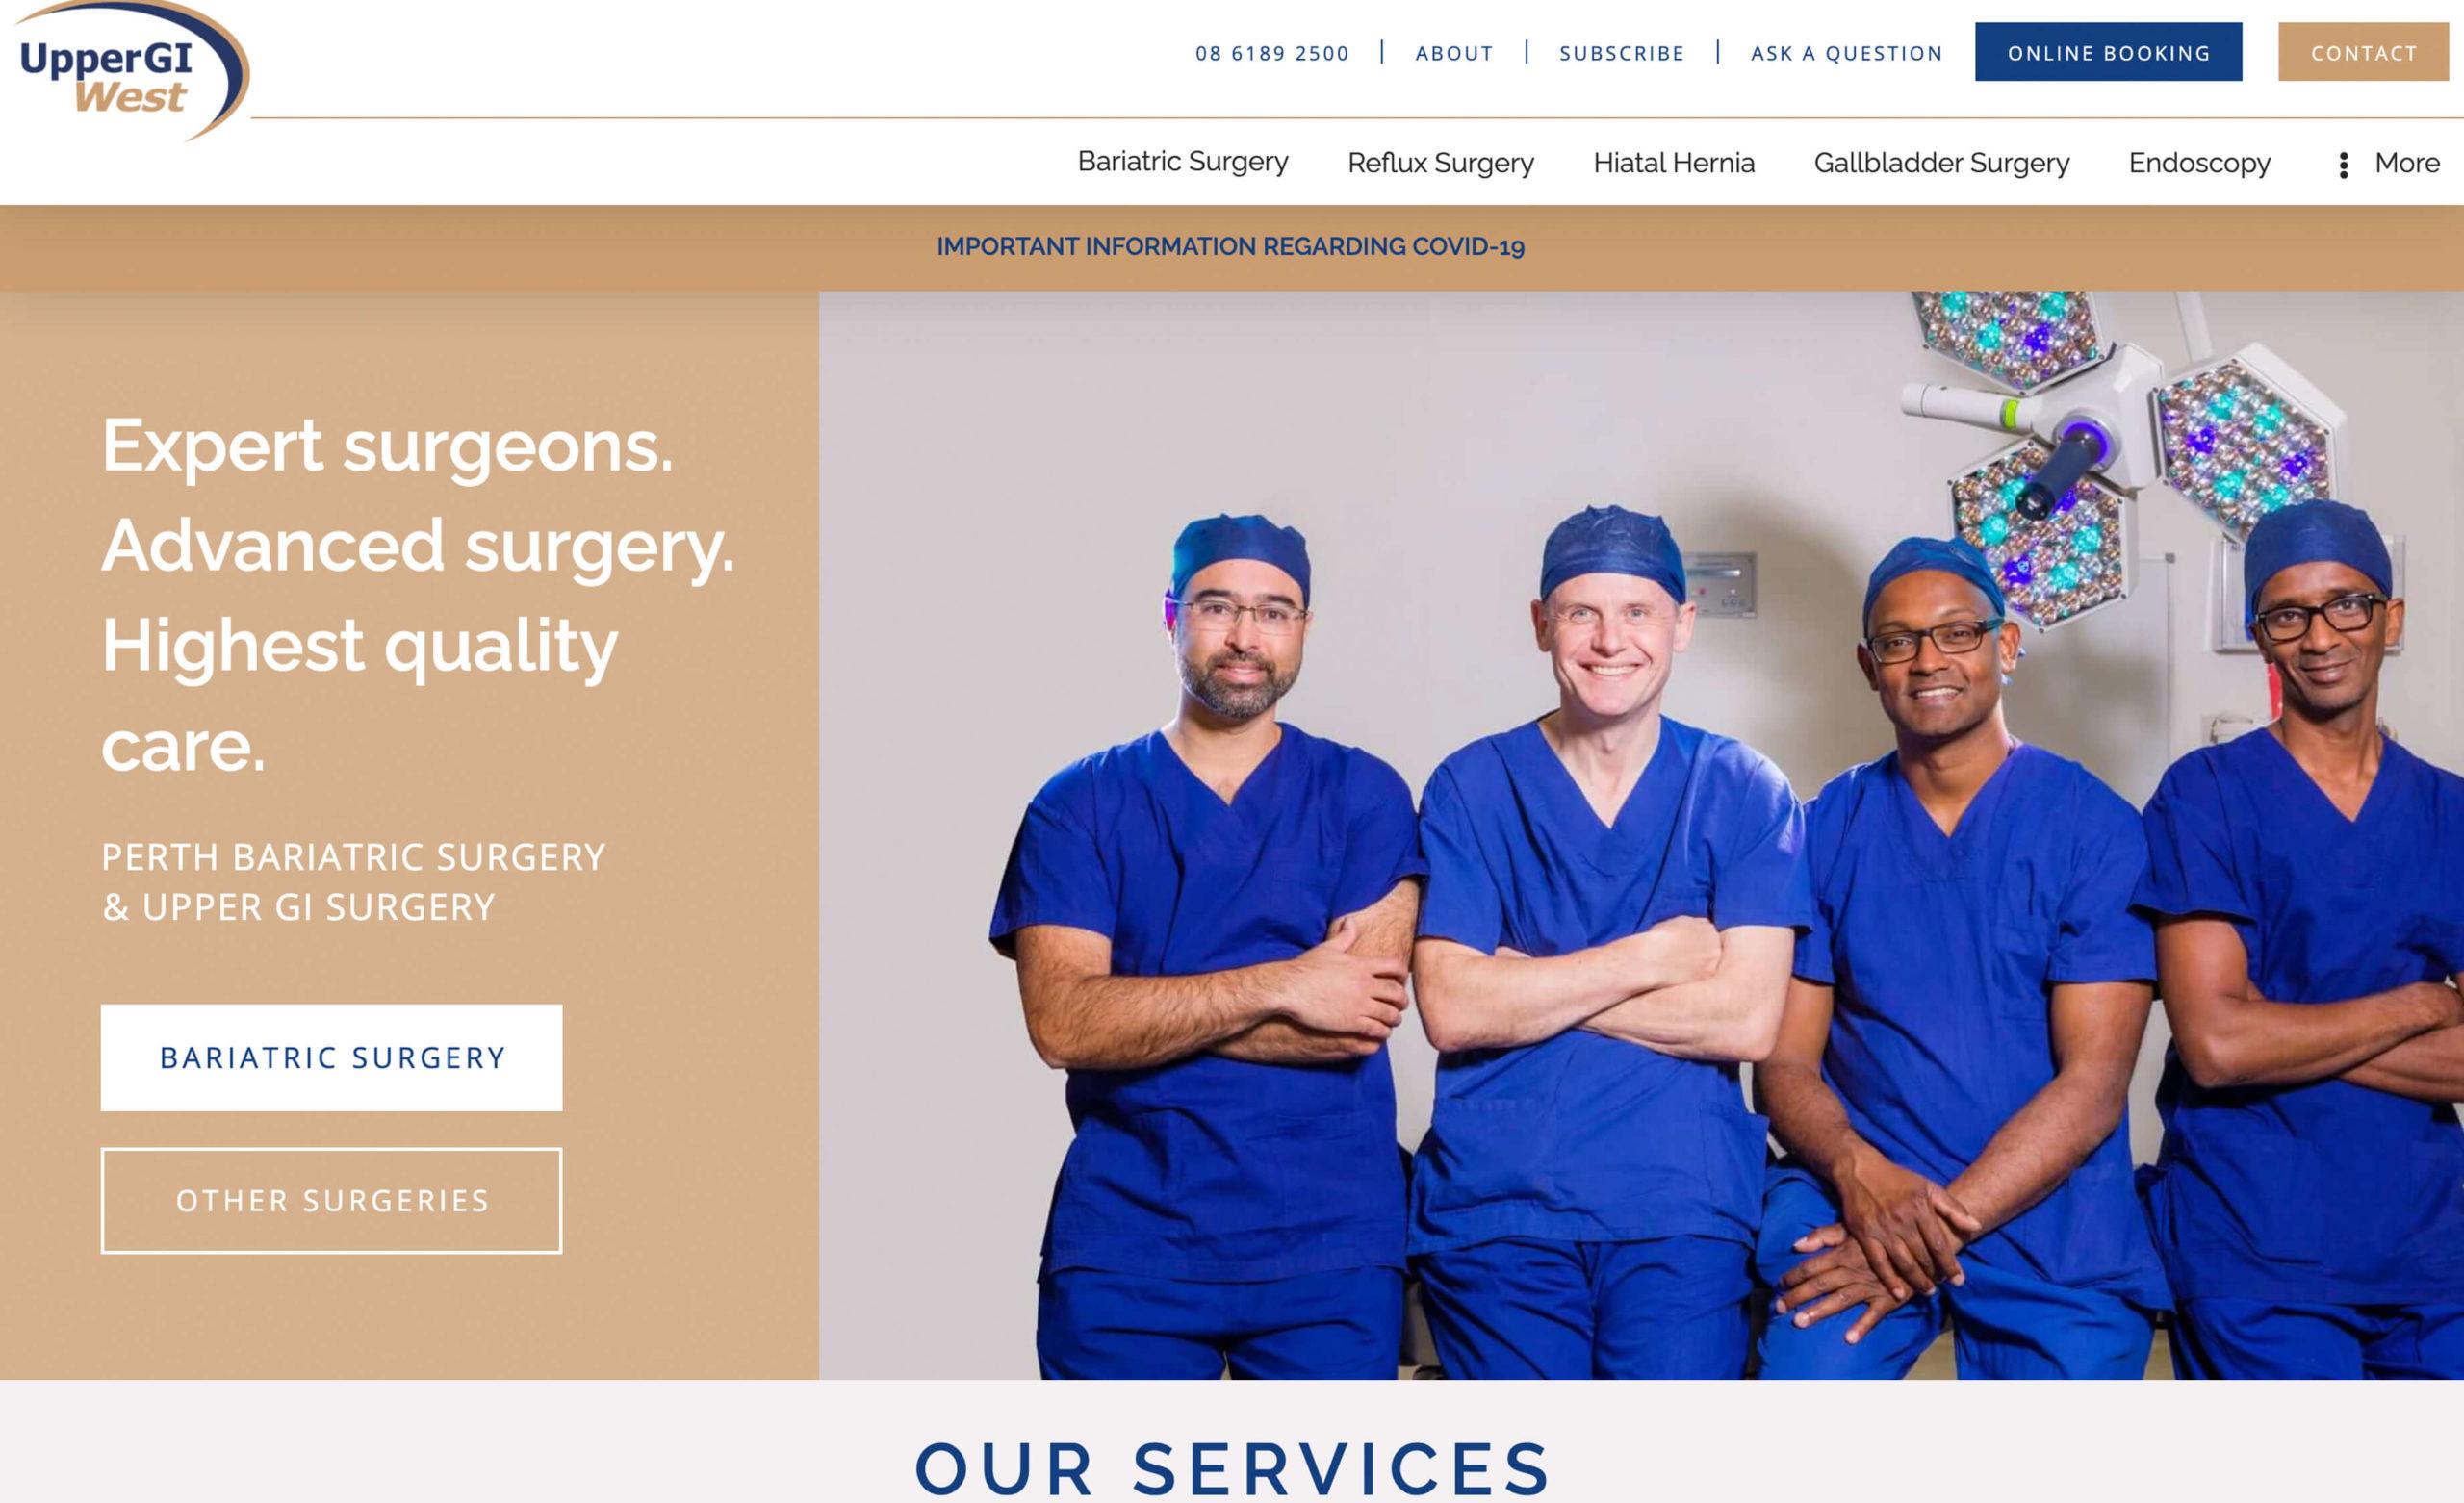 Upper GI West   Bariatric Surgery